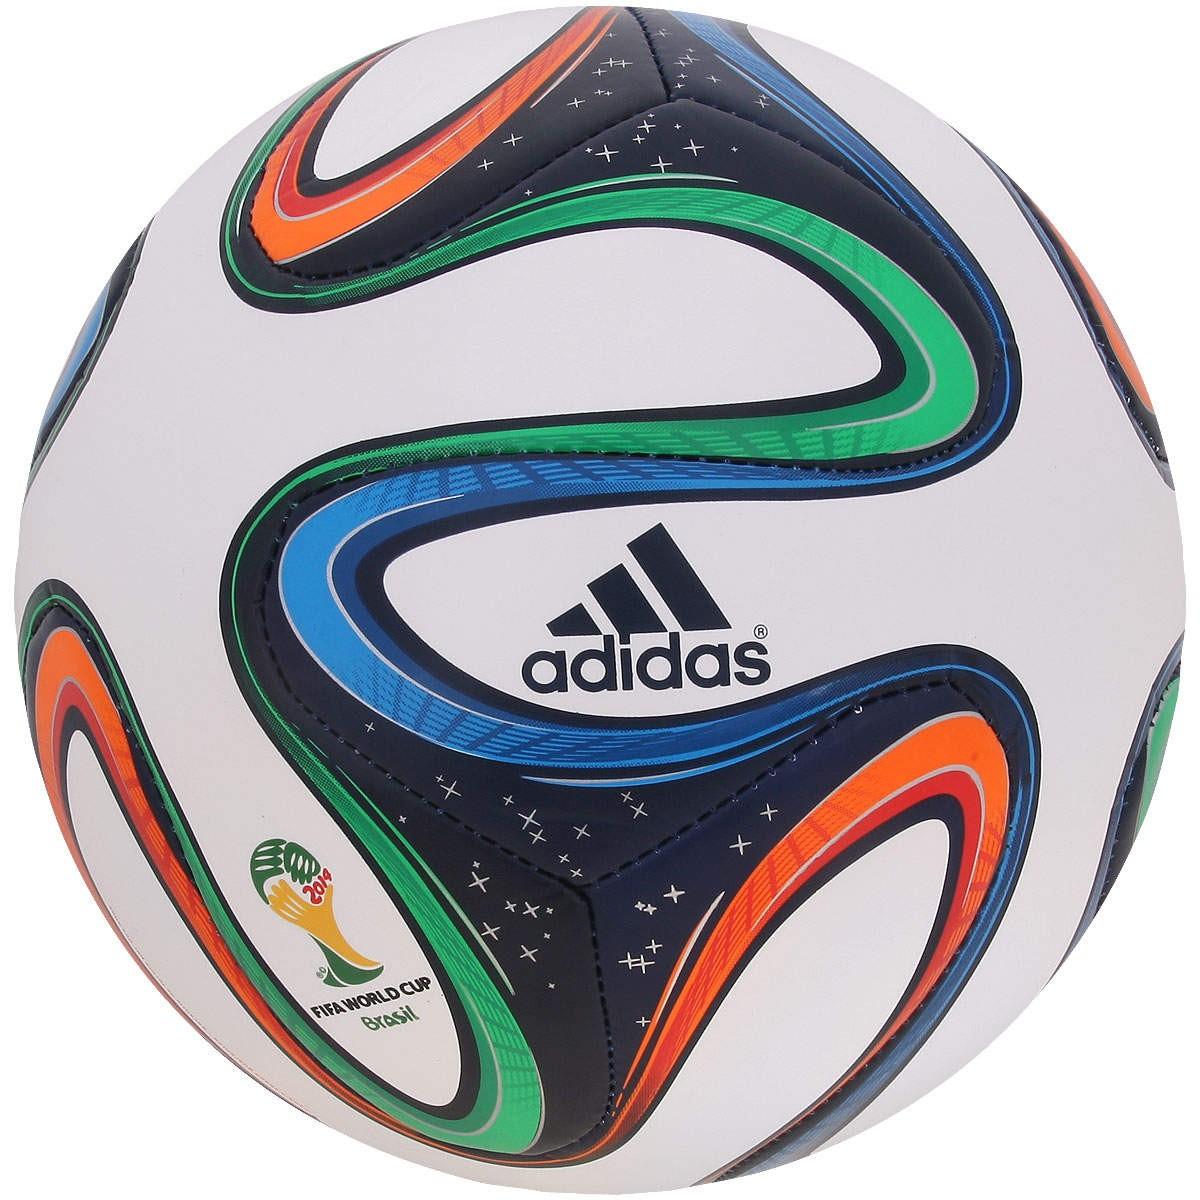 Bola Adidas Brazuca WC 14 Glider Top ... 9a0c9593a7ed5